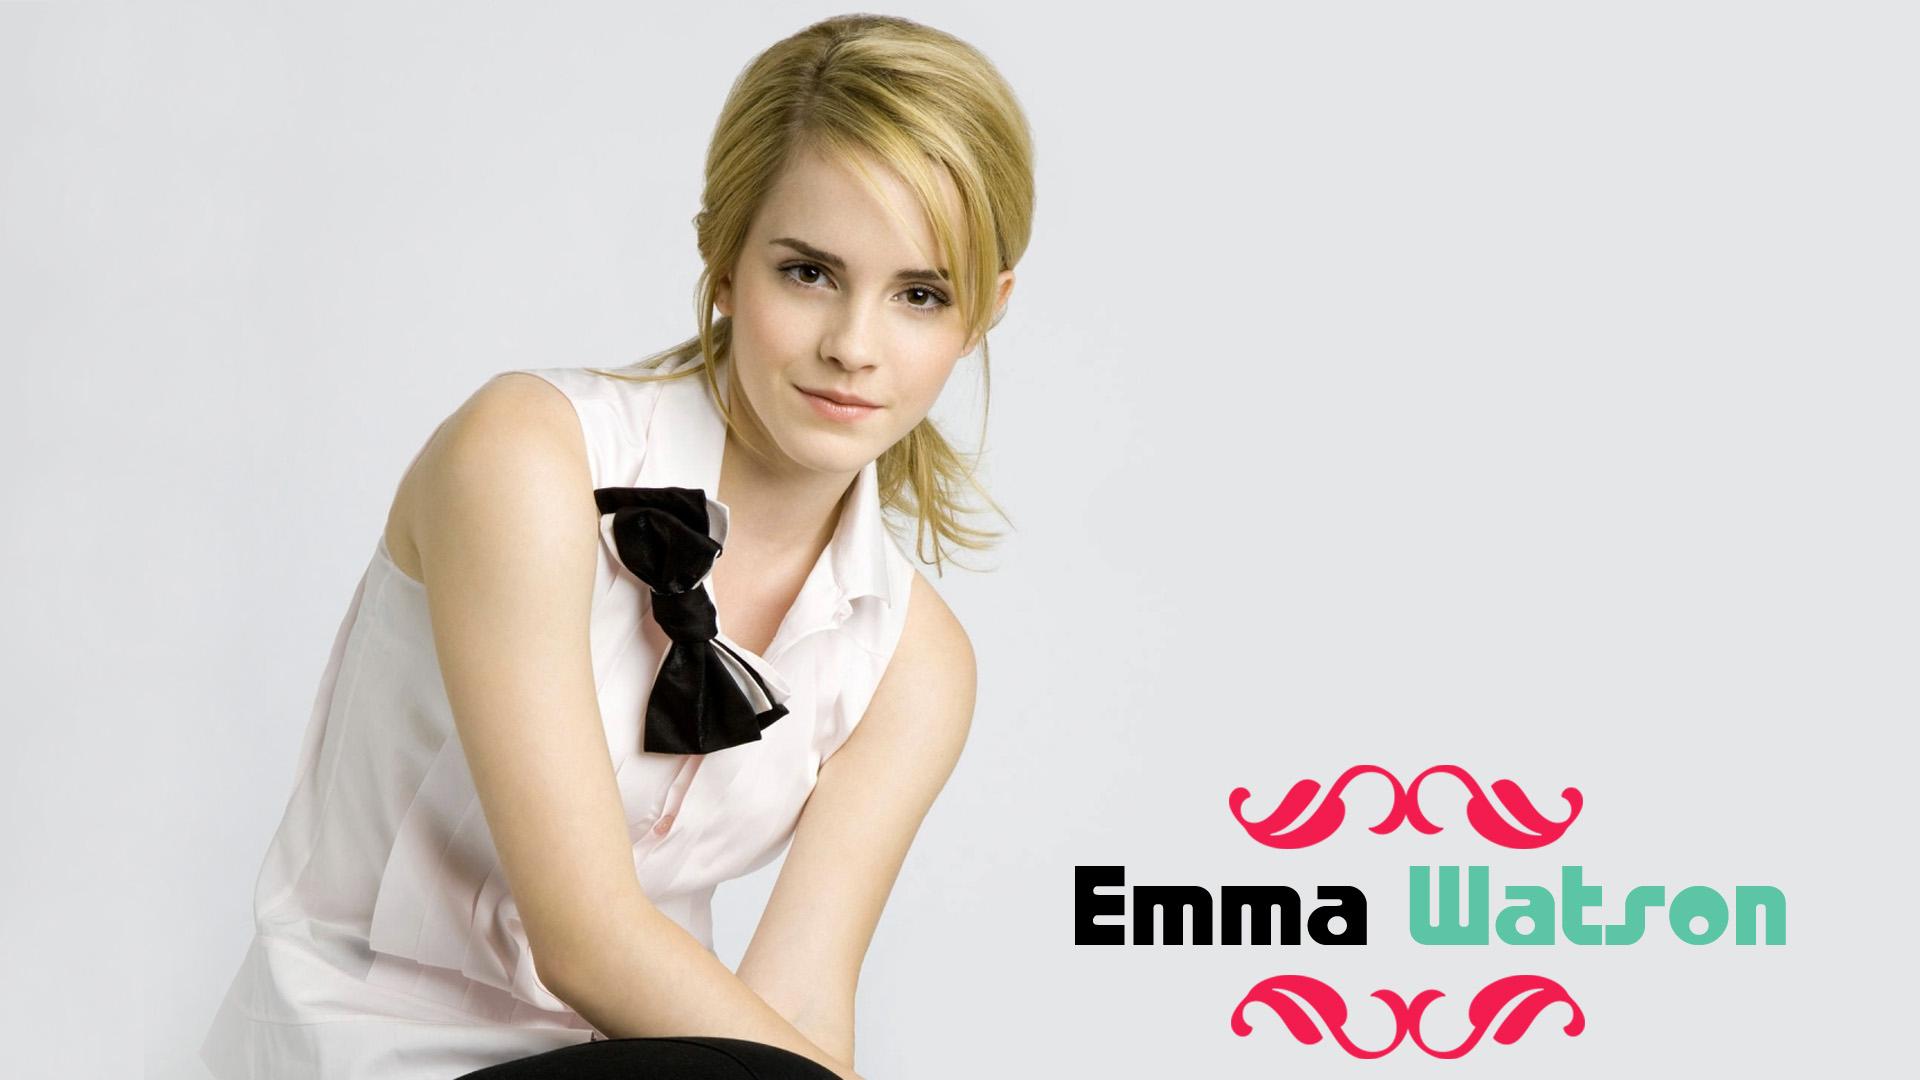 Emma Watson Pretty   Choice Wallpaper Choice Wallpaper 1920x1080